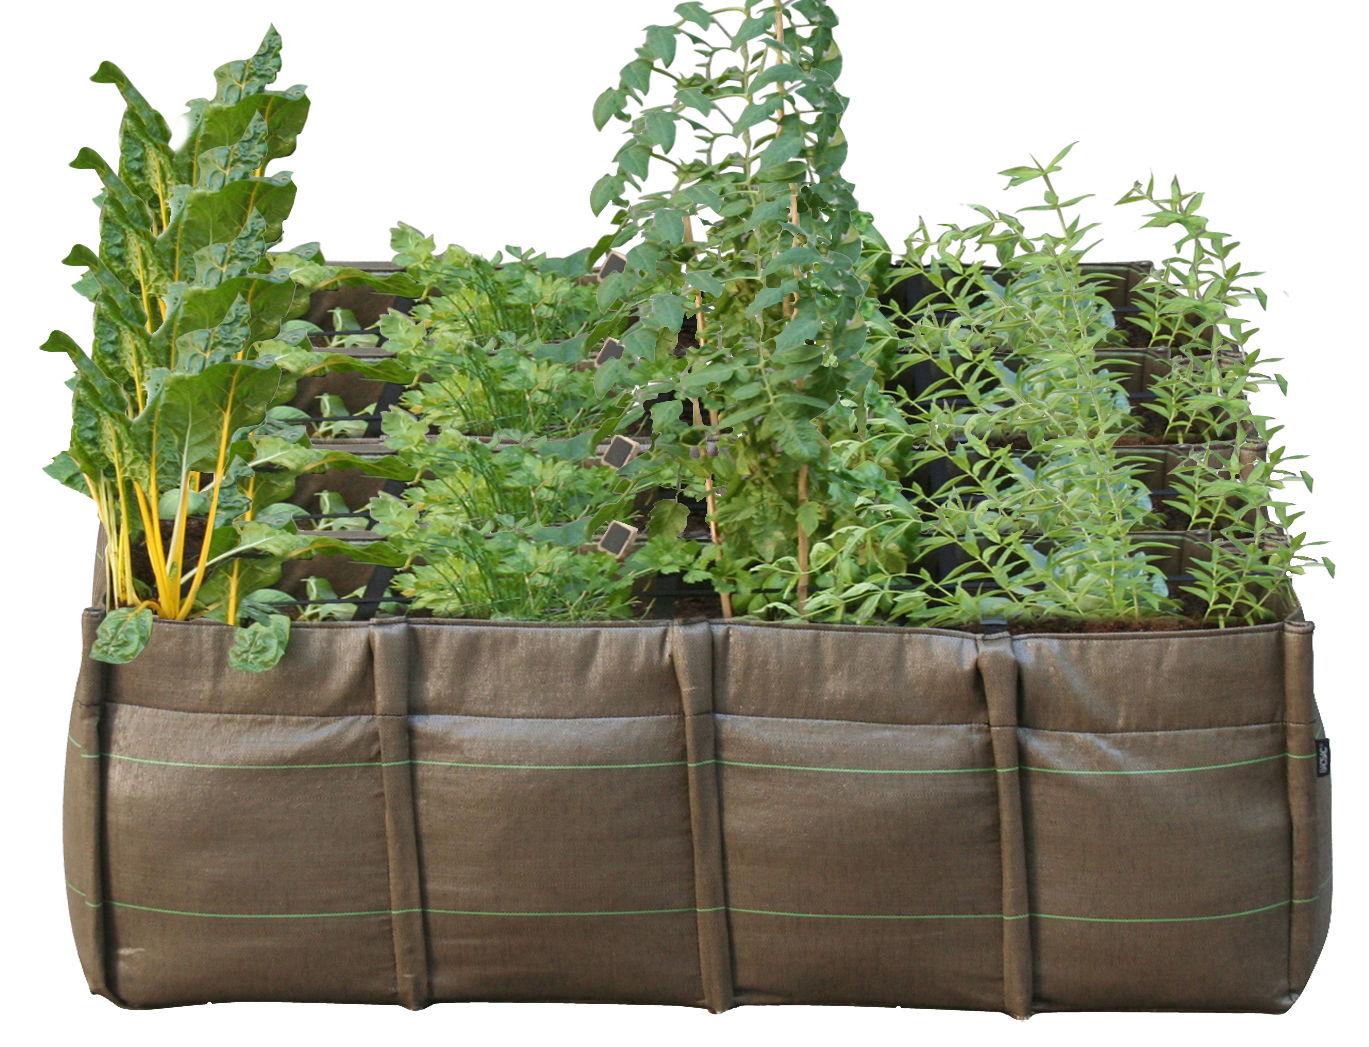 jardini re bacsquare geotextile outdoor 550 l 16. Black Bedroom Furniture Sets. Home Design Ideas